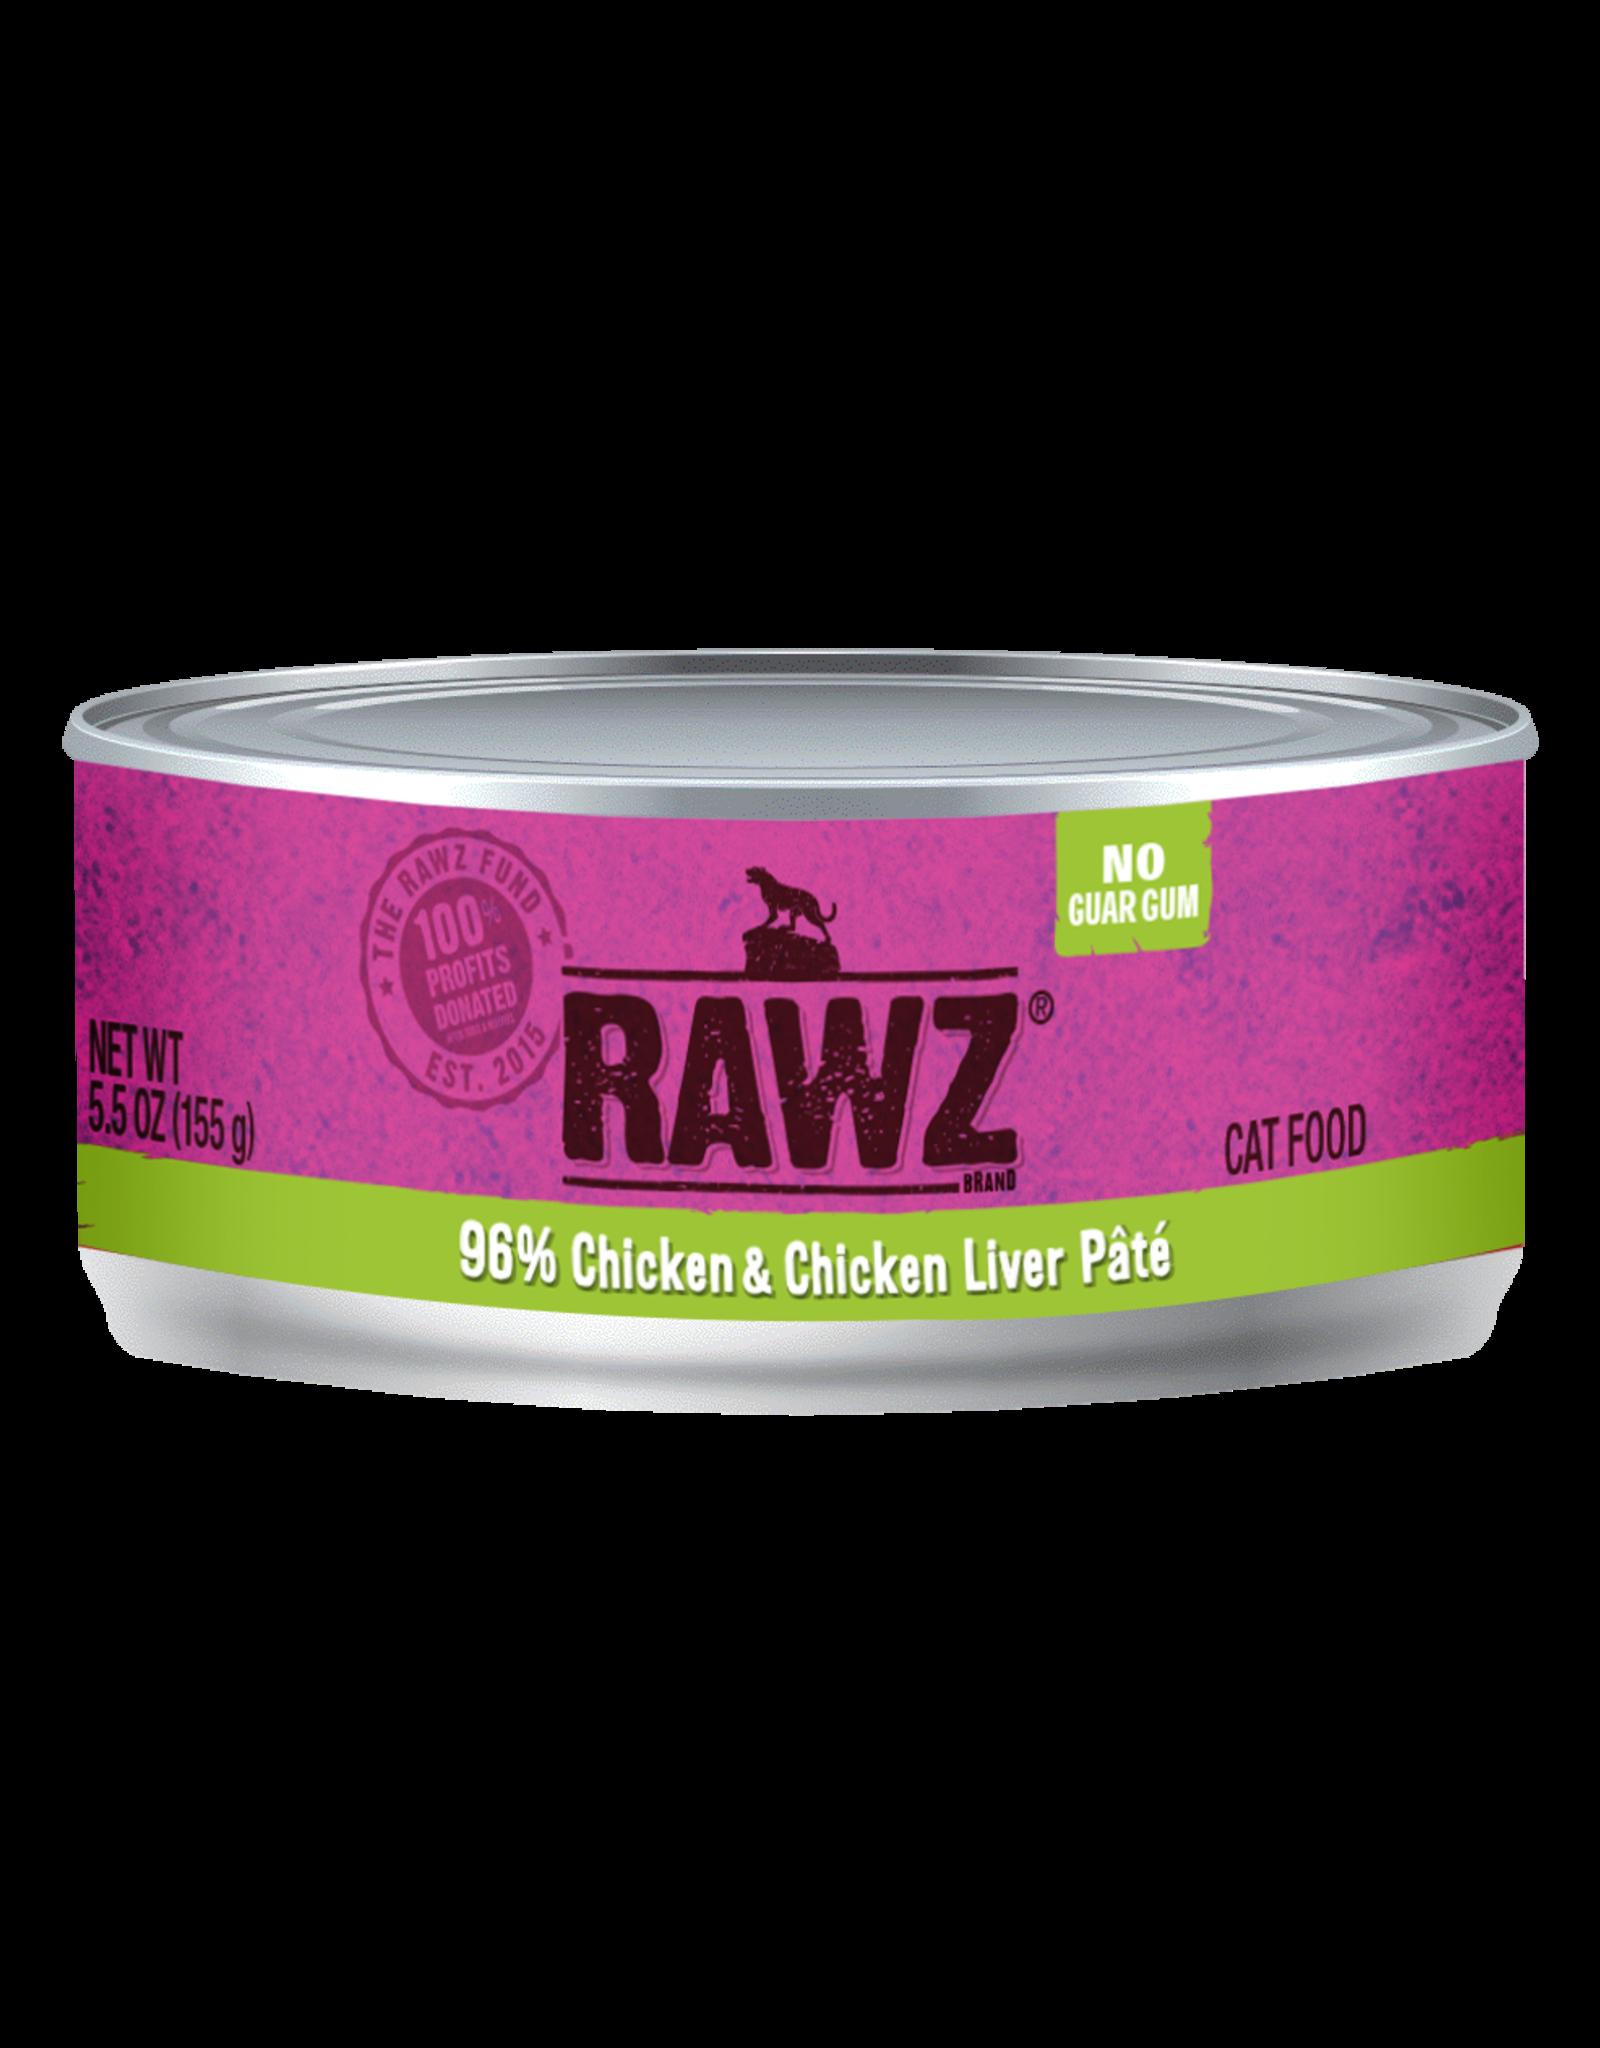 Rawz RAWZ \ CAT \ CAN \ 96% Chicken & Chick Liver 24 x 5.5oz